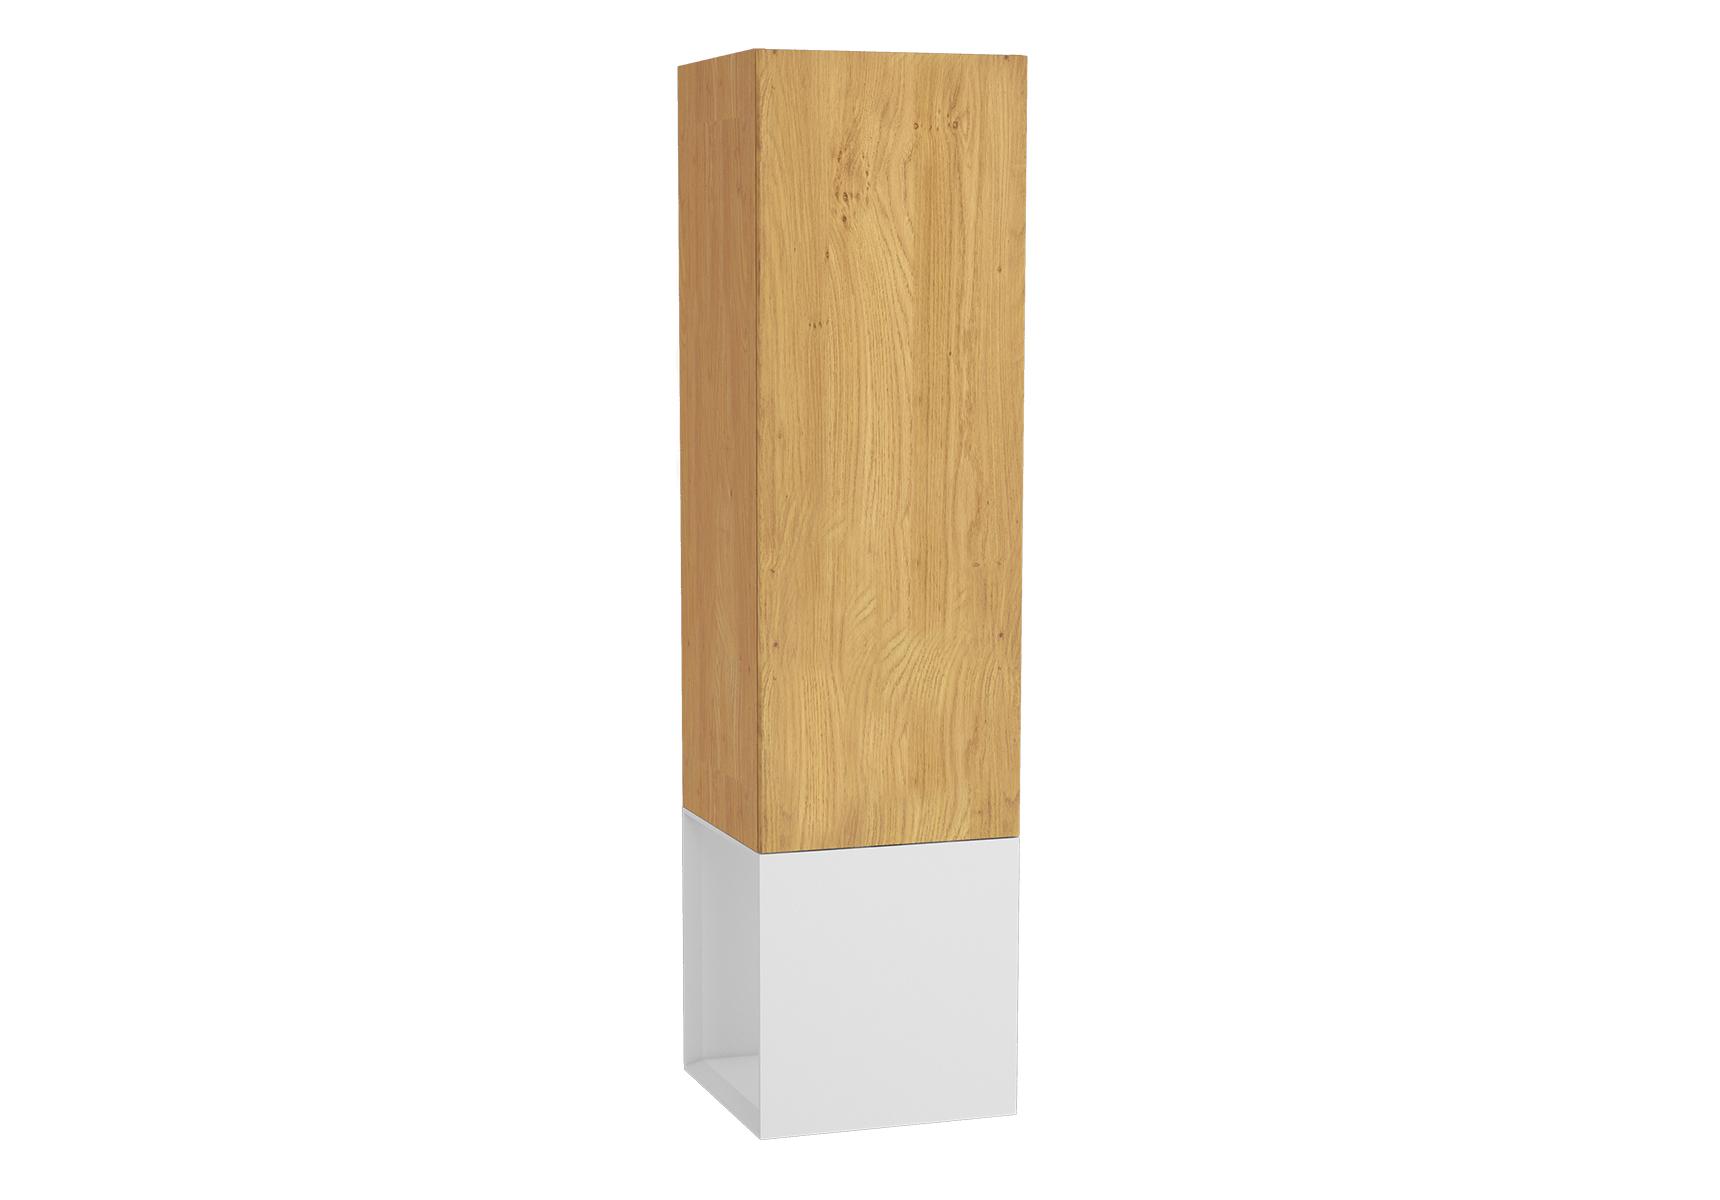 Frame armoire haute, 39 cm, chêne doré, mat blanc, droite